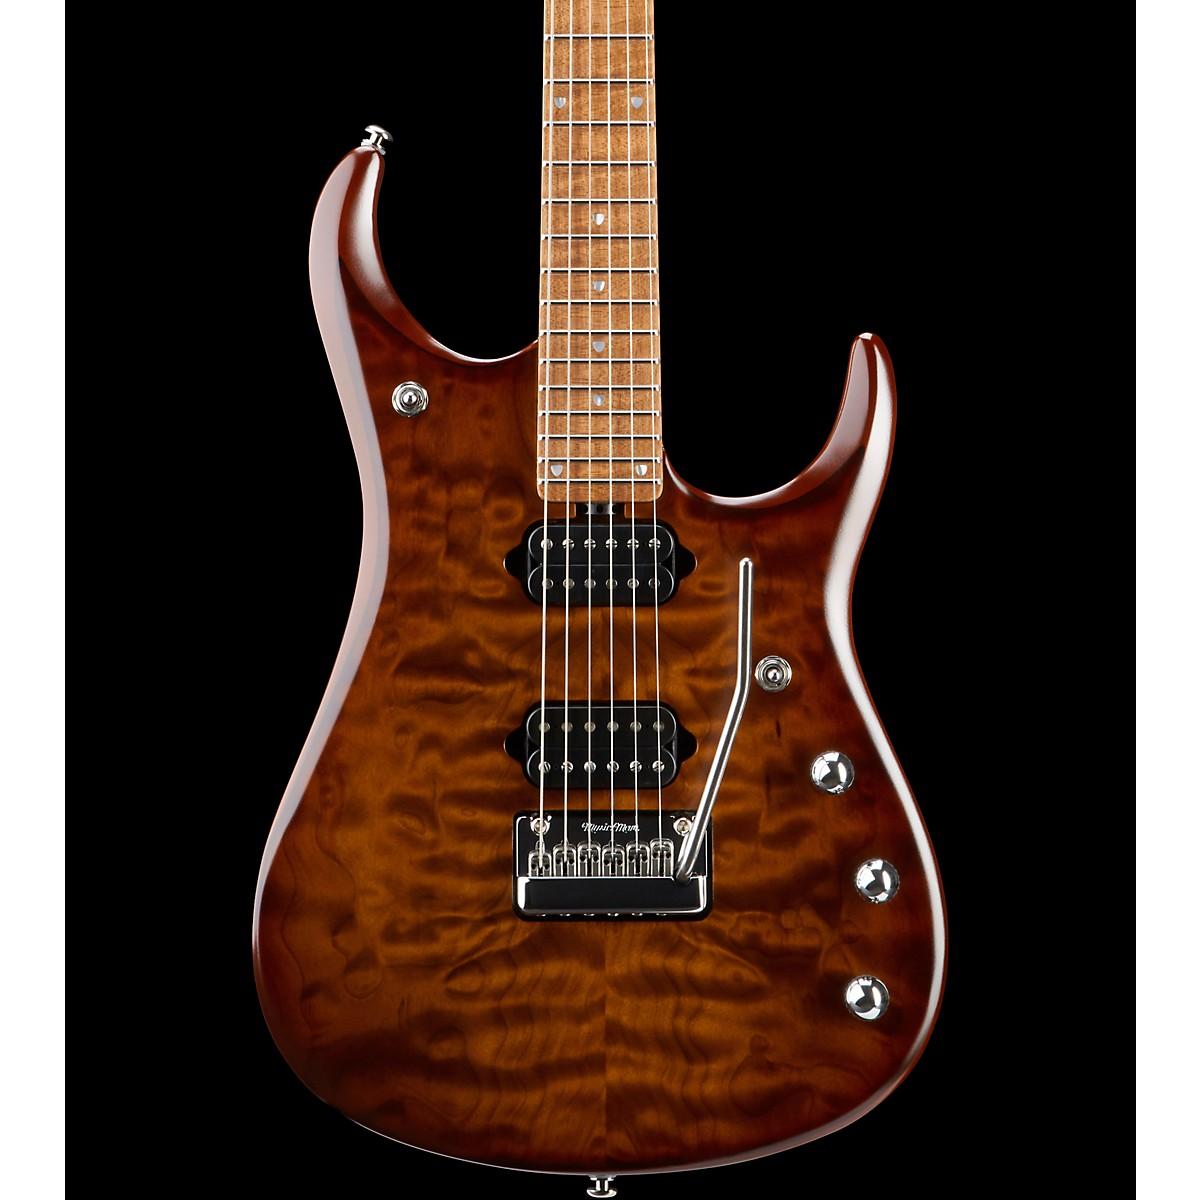 Ernie Ball Music Man JP15 Roasted Quilt Maple Top Electric Guitar